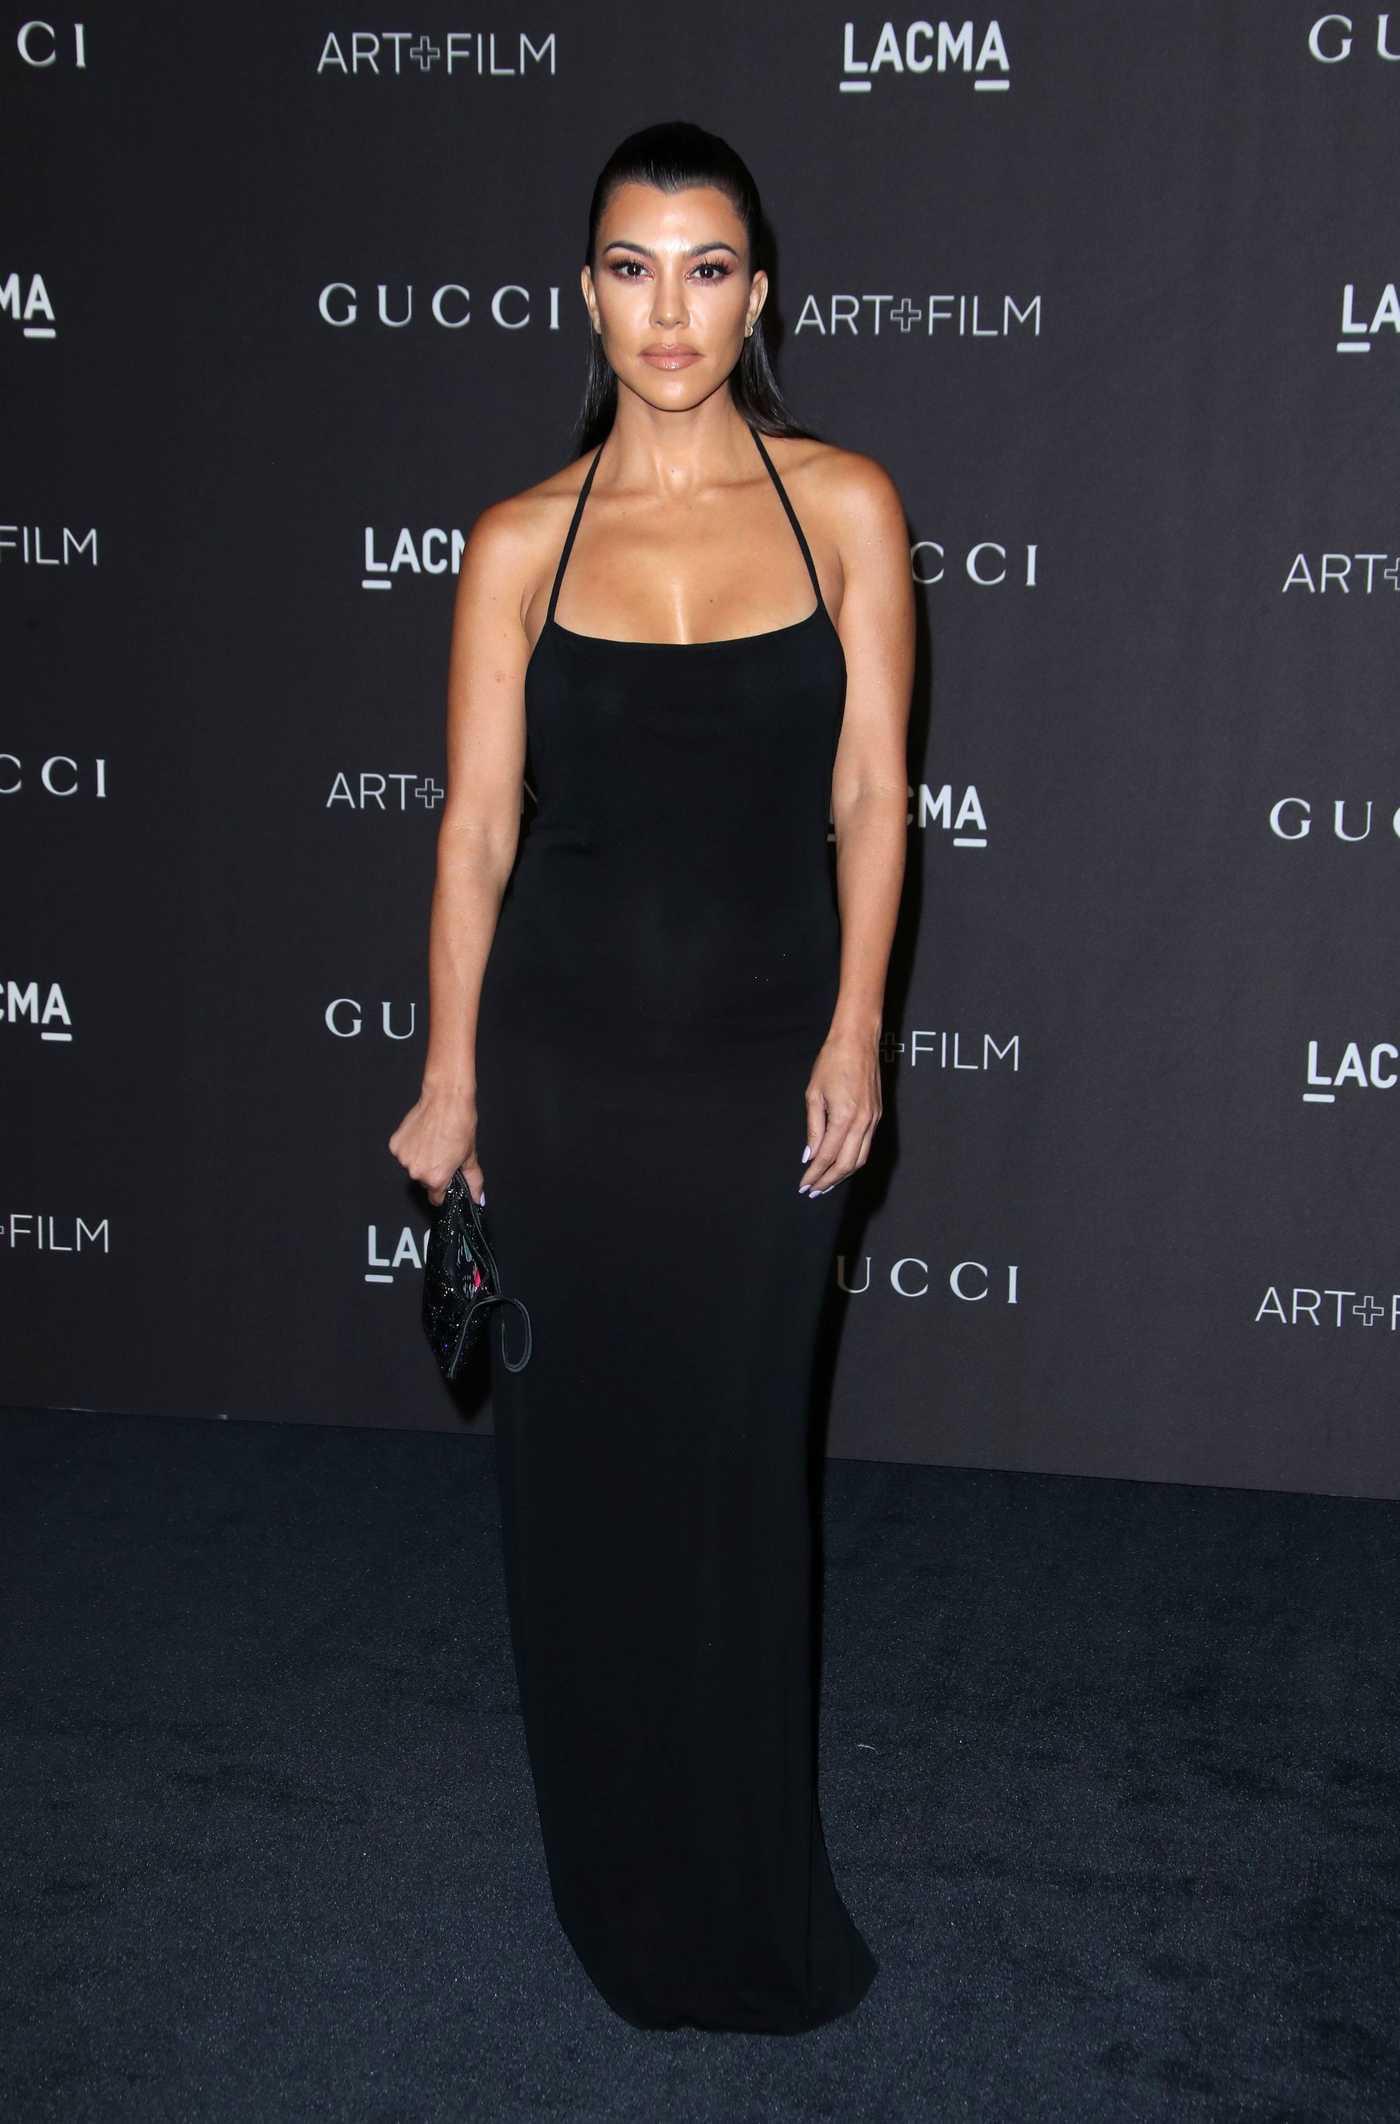 Kourtney Kardashian Attends 2018 LACMA Art and Film Gala in Los Angeles 11/03/2018